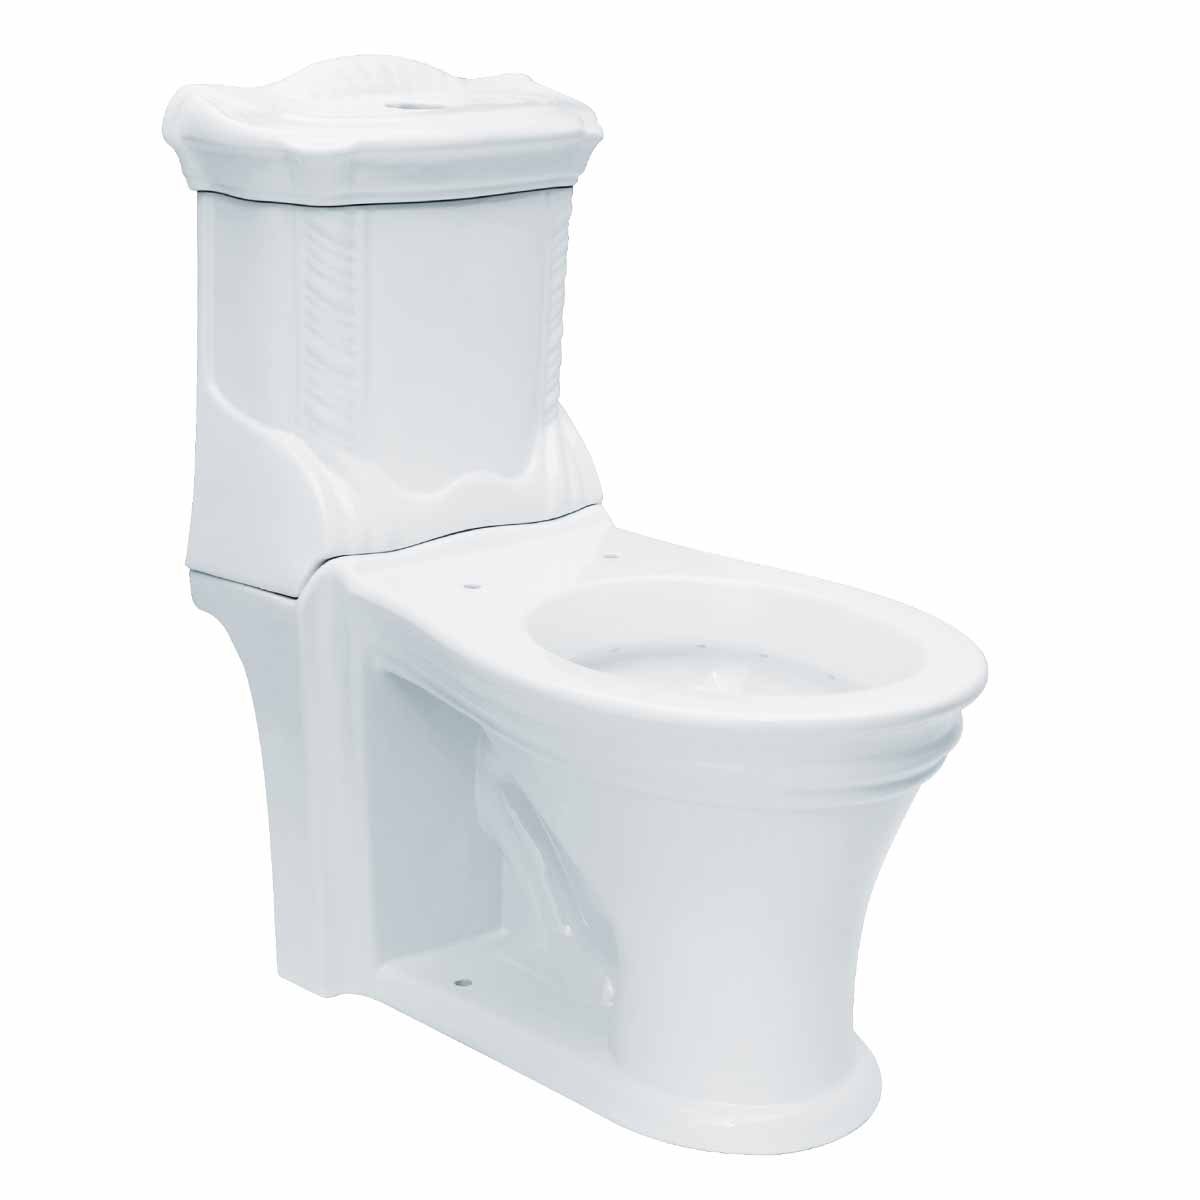 White Mystic Elongated Dual Flush Toilet - Perfect Height & Elongated Bowl Size Toilets